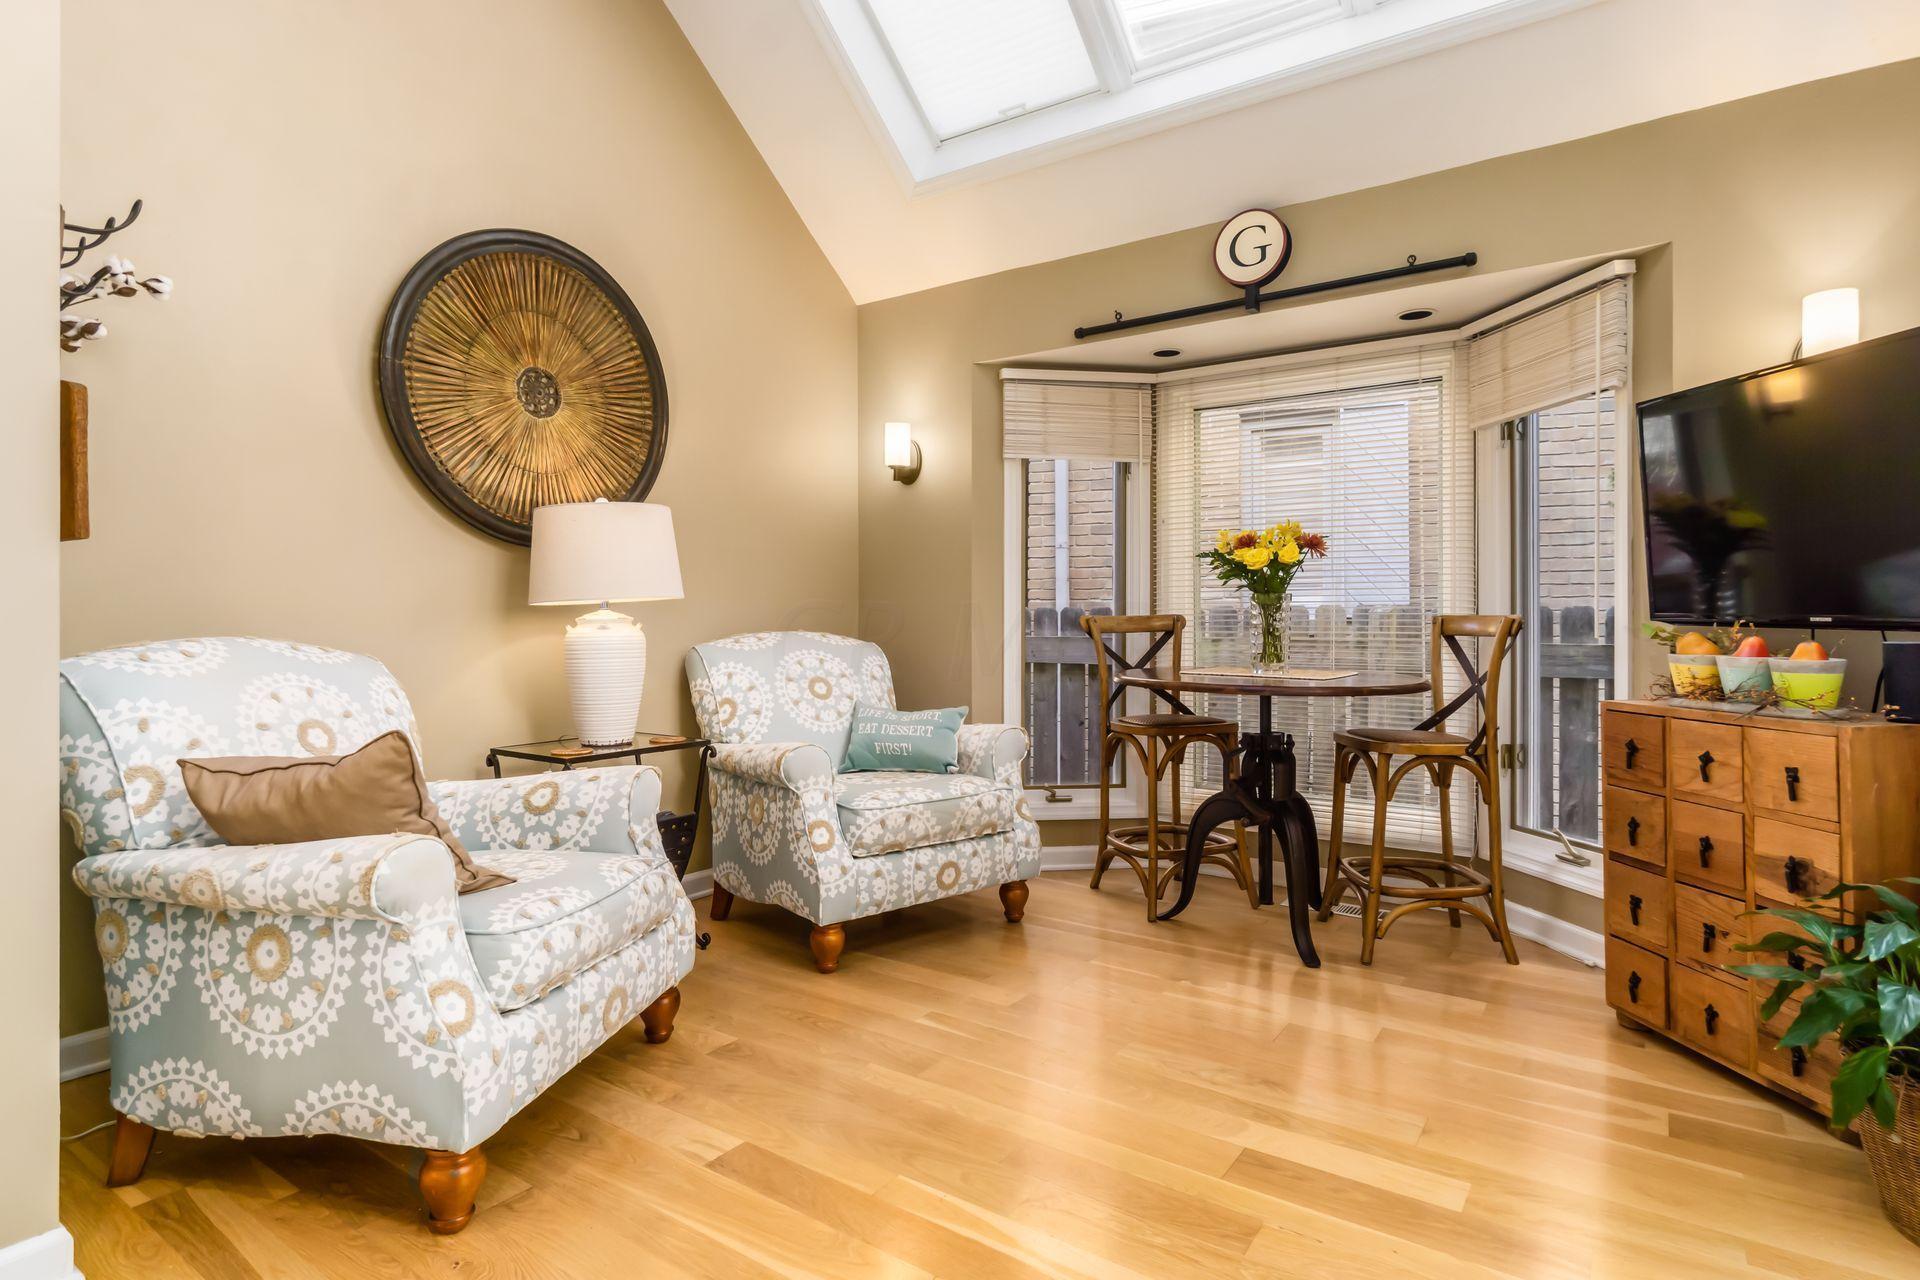 8450 Gullane Court, Dublin, Ohio 43017, 3 Bedrooms Bedrooms, ,3 BathroomsBathrooms,Residential,For Sale,Gullane,220040035